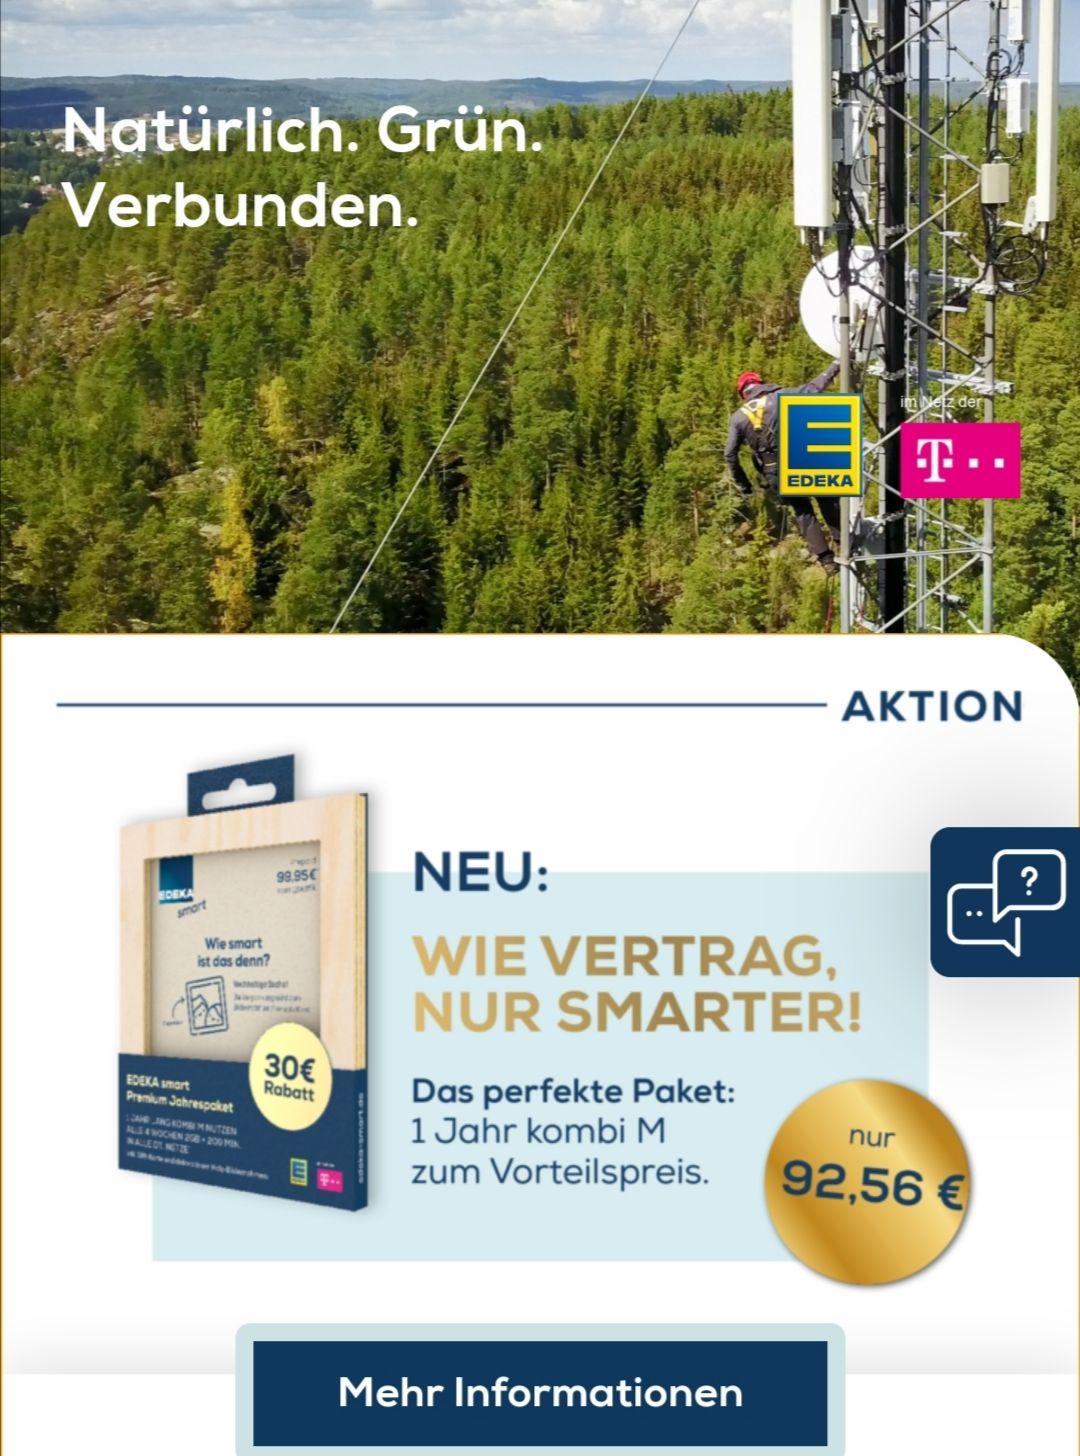 Edeka Jahrespaket Prepaid Kombi M : 2Gb Telekom Netz